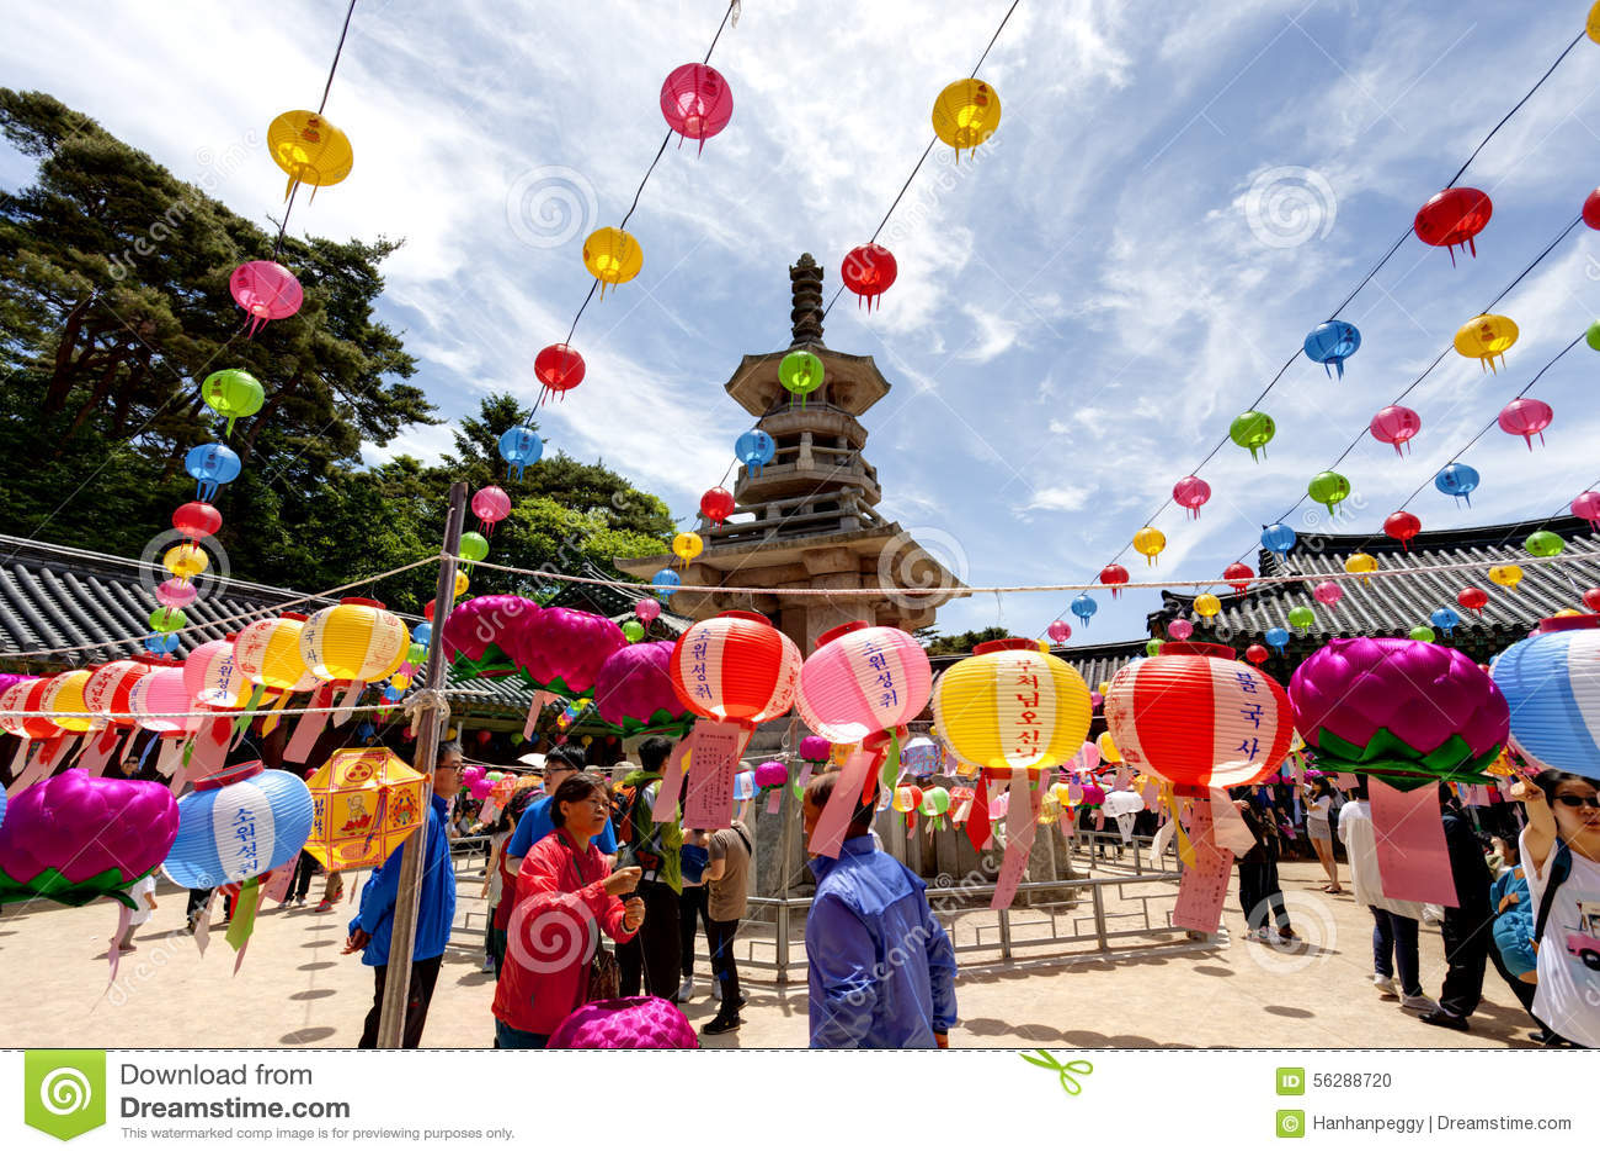 Korea Celebrating Buddhas Birthday Editorial Image Image Of Asia